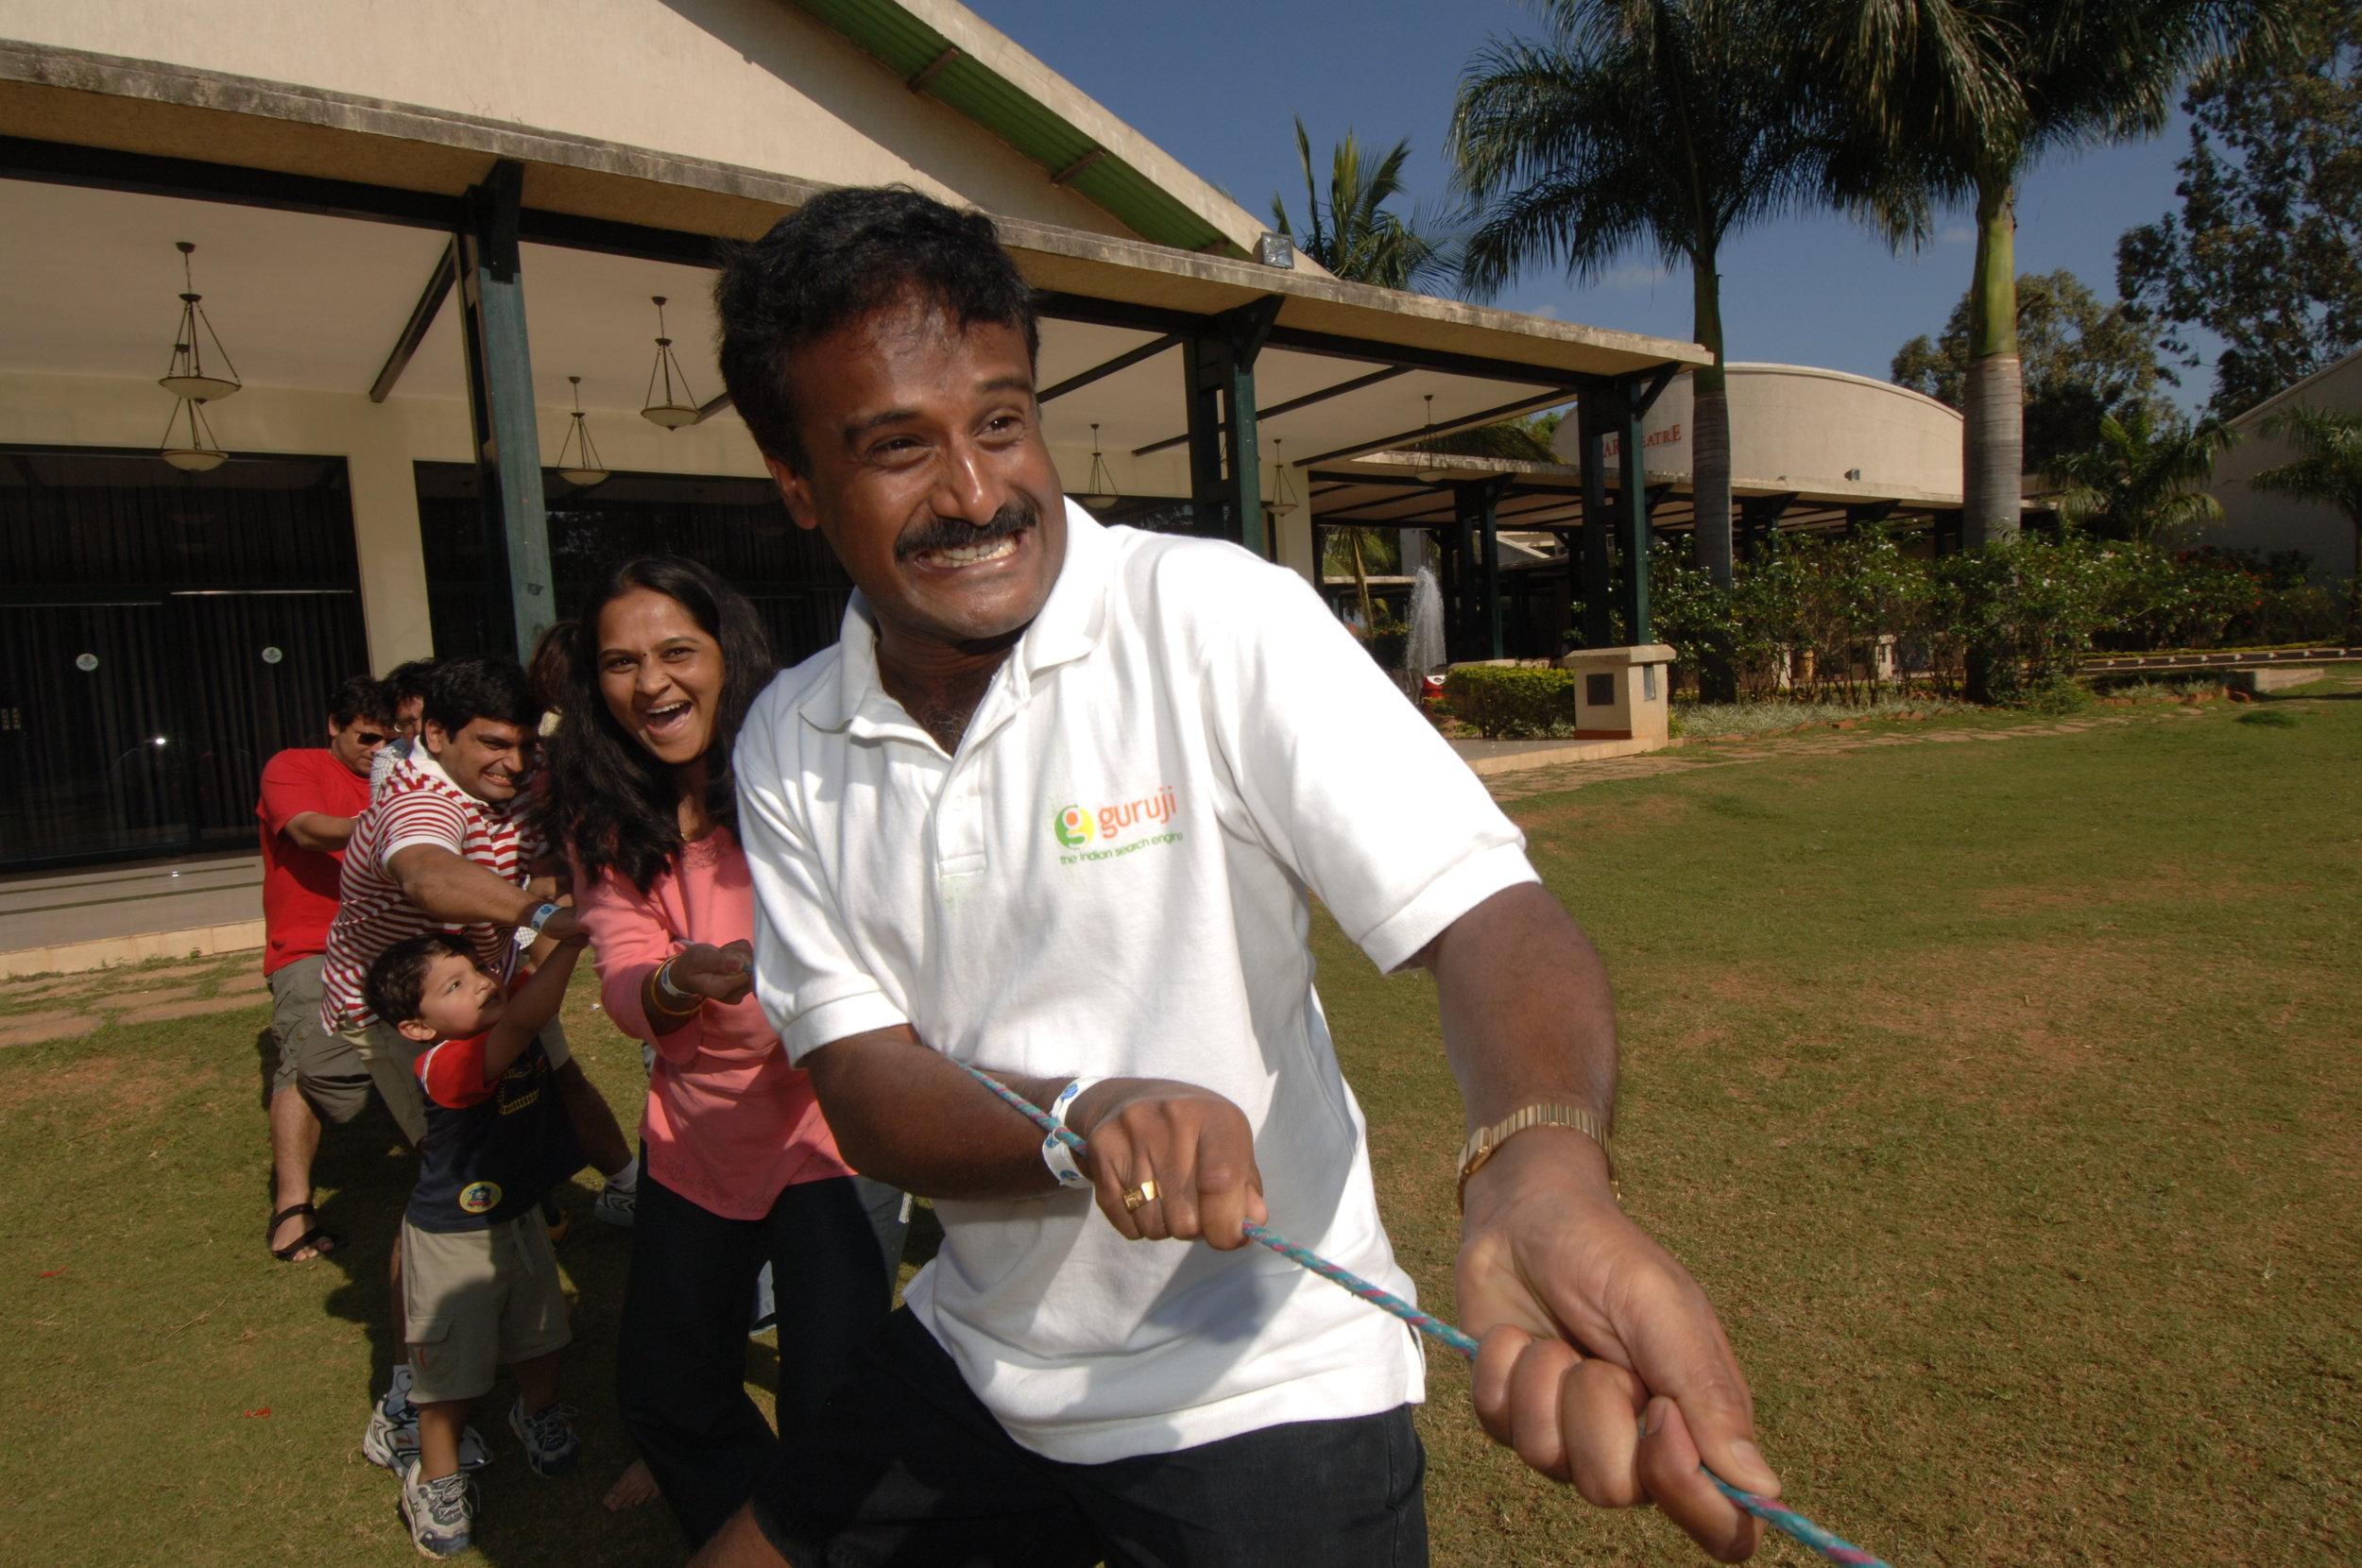 Guruji employees enjoying a game of 'tug of war' at play day at Club Cabana at an exclusive resort on the outskirts of Bangalore.